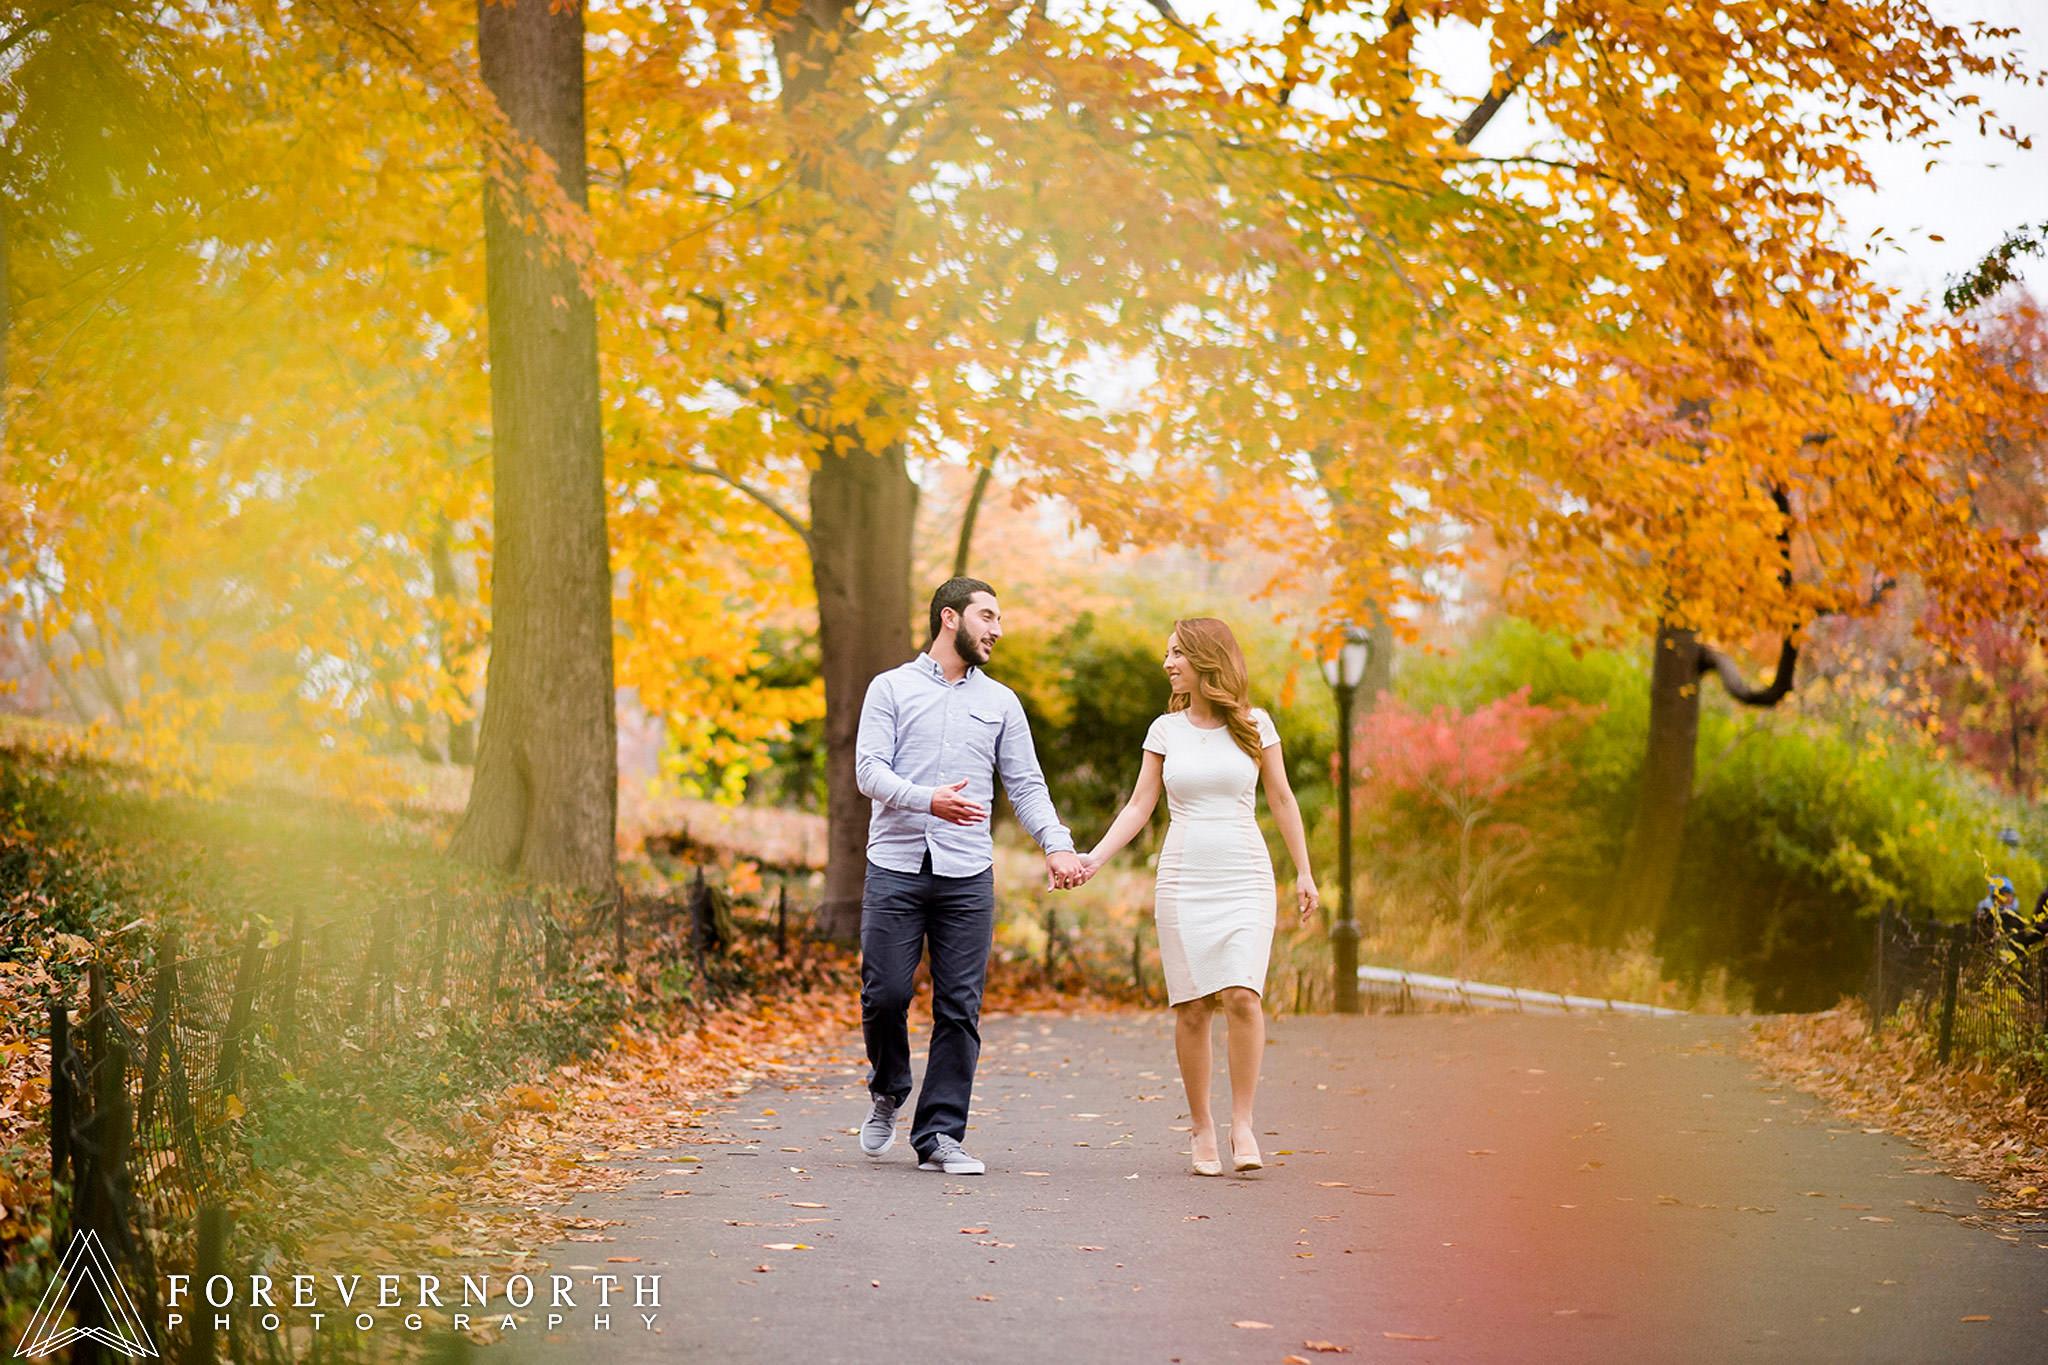 Giangrande-Central-Park-New-York-Engagement-Photos-07.JPG